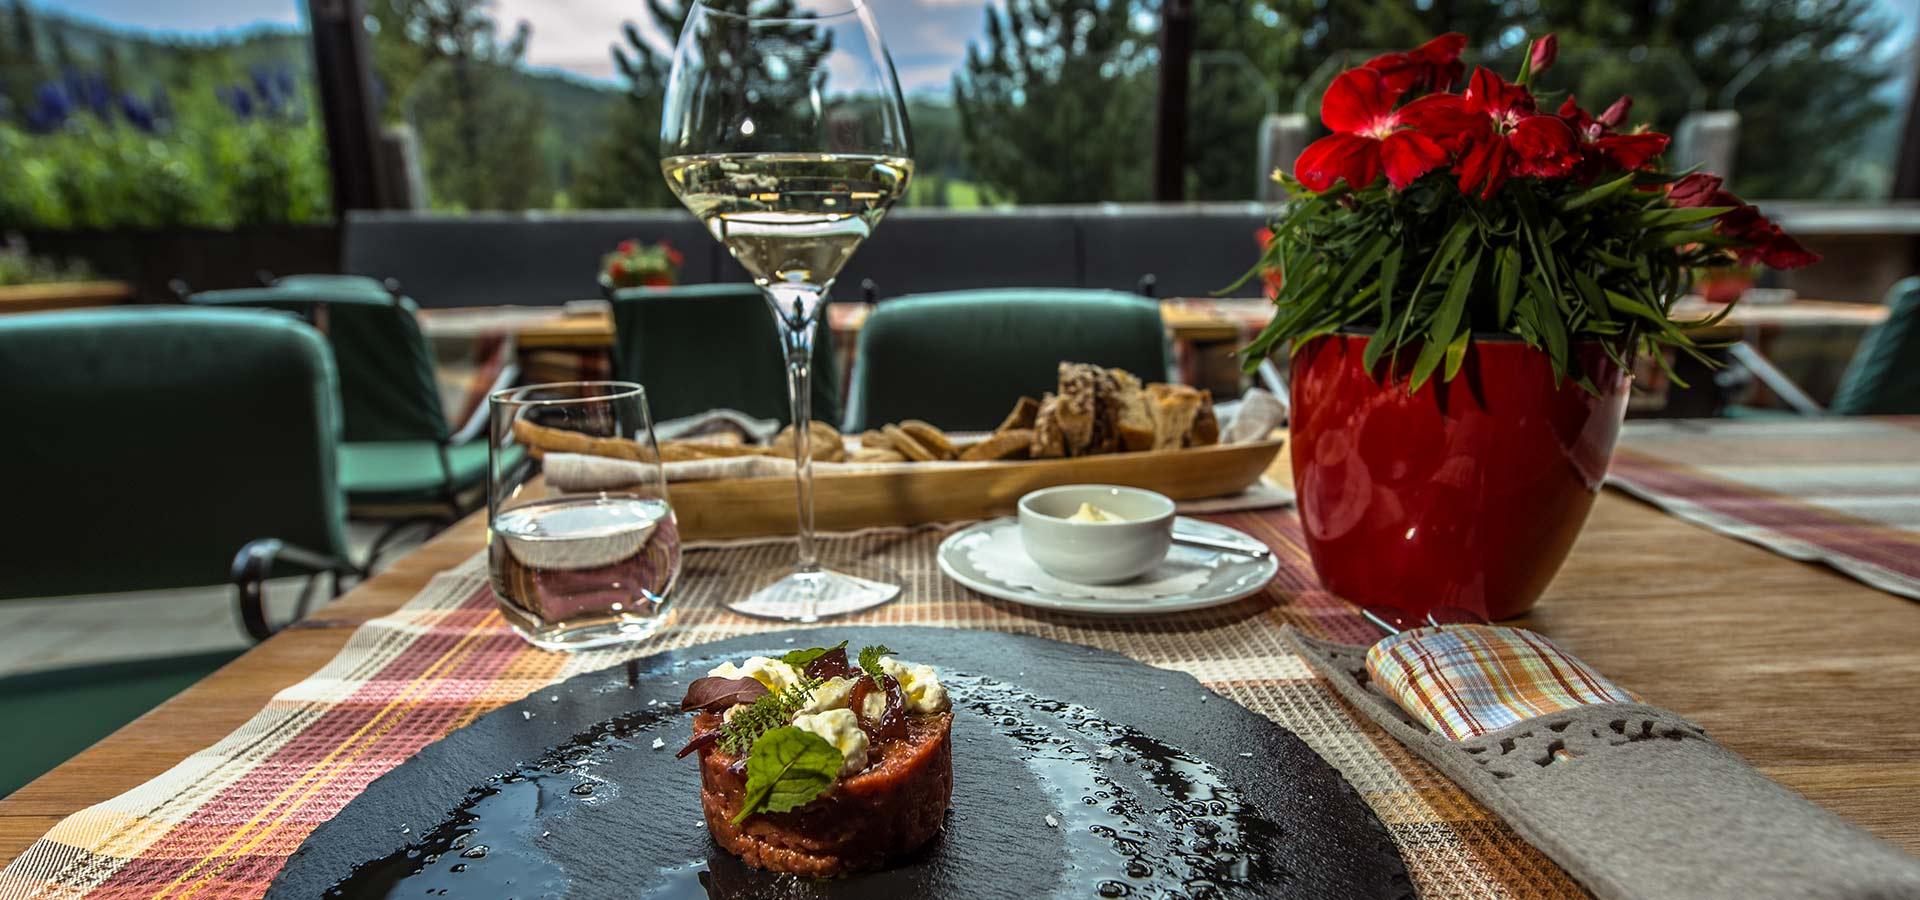 infini-terrace-restaurant-dolomites-2